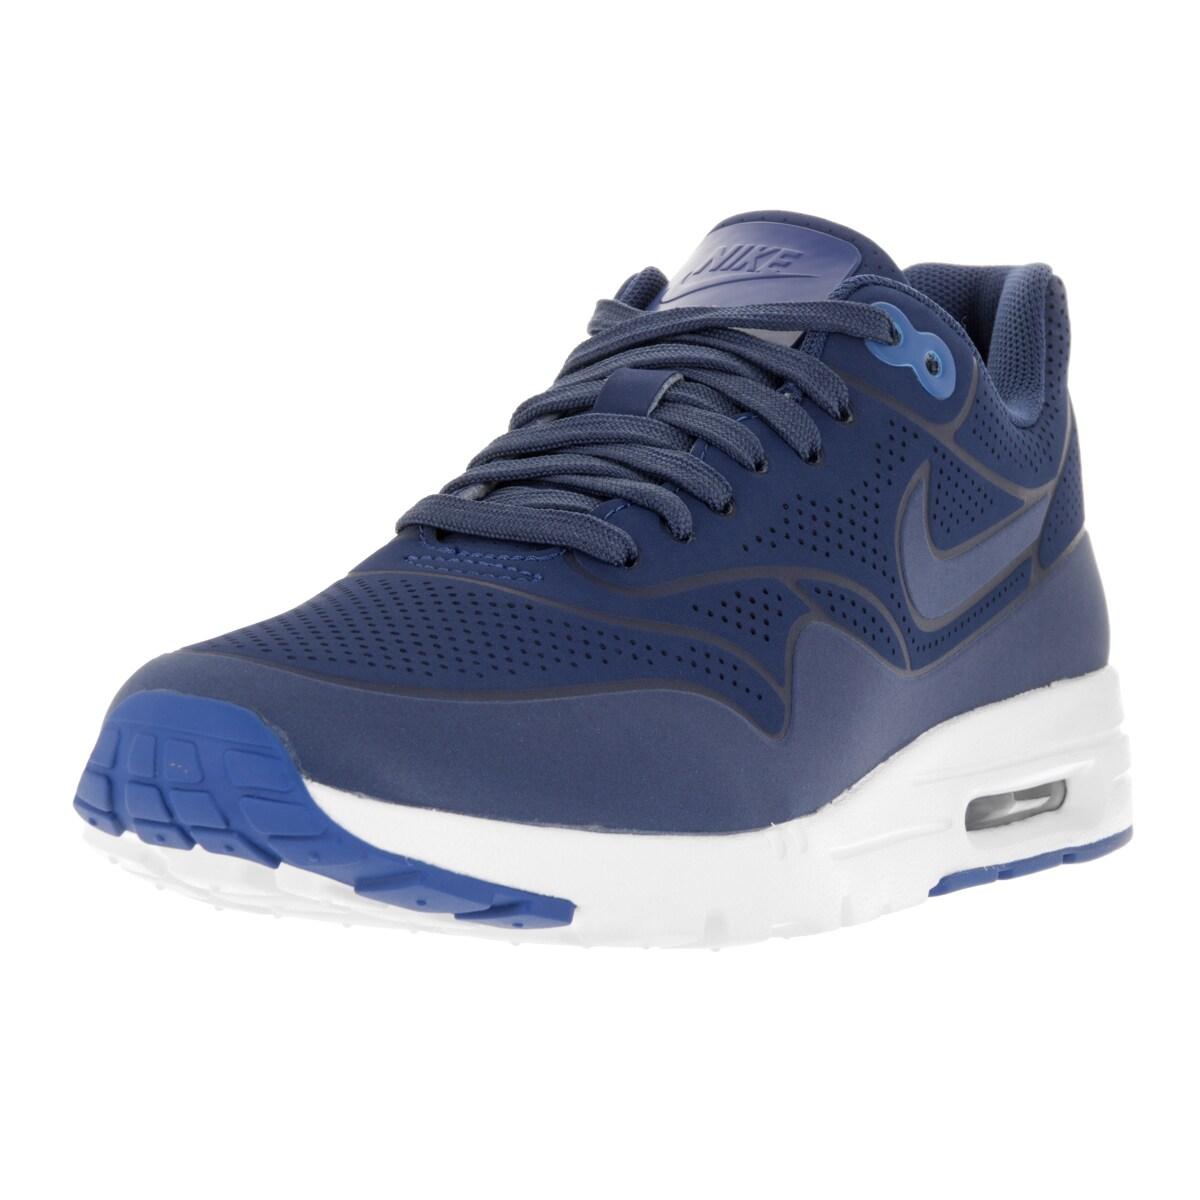 Nike Women's Air Max 1 Ultra Moire Blue Plastic Running S...